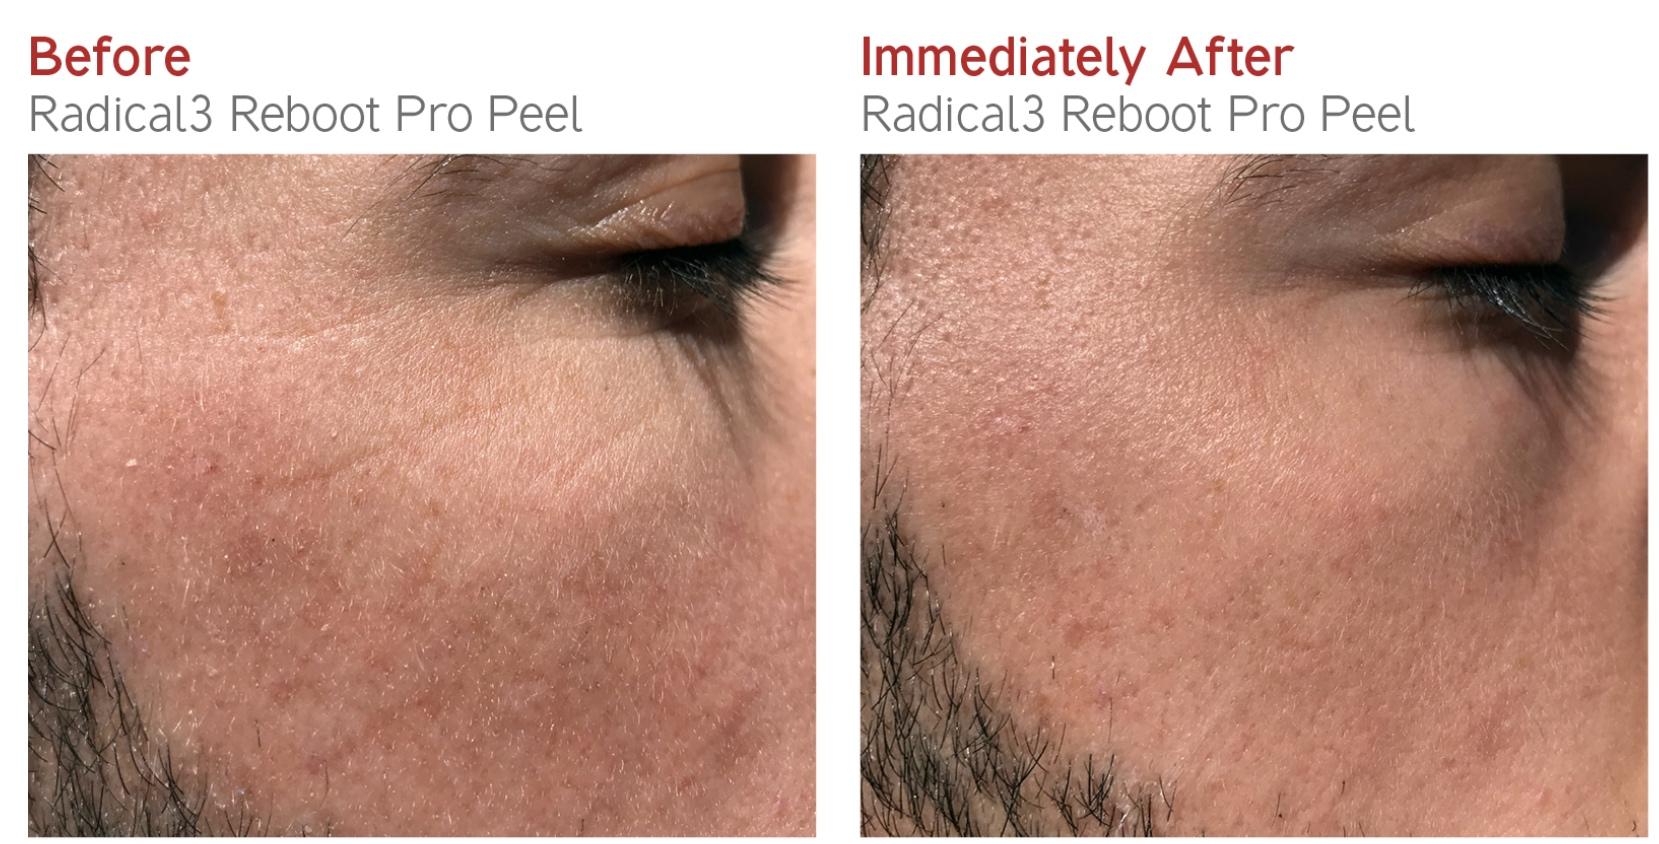 Before-After - Radical3 Reboot Pro Peel